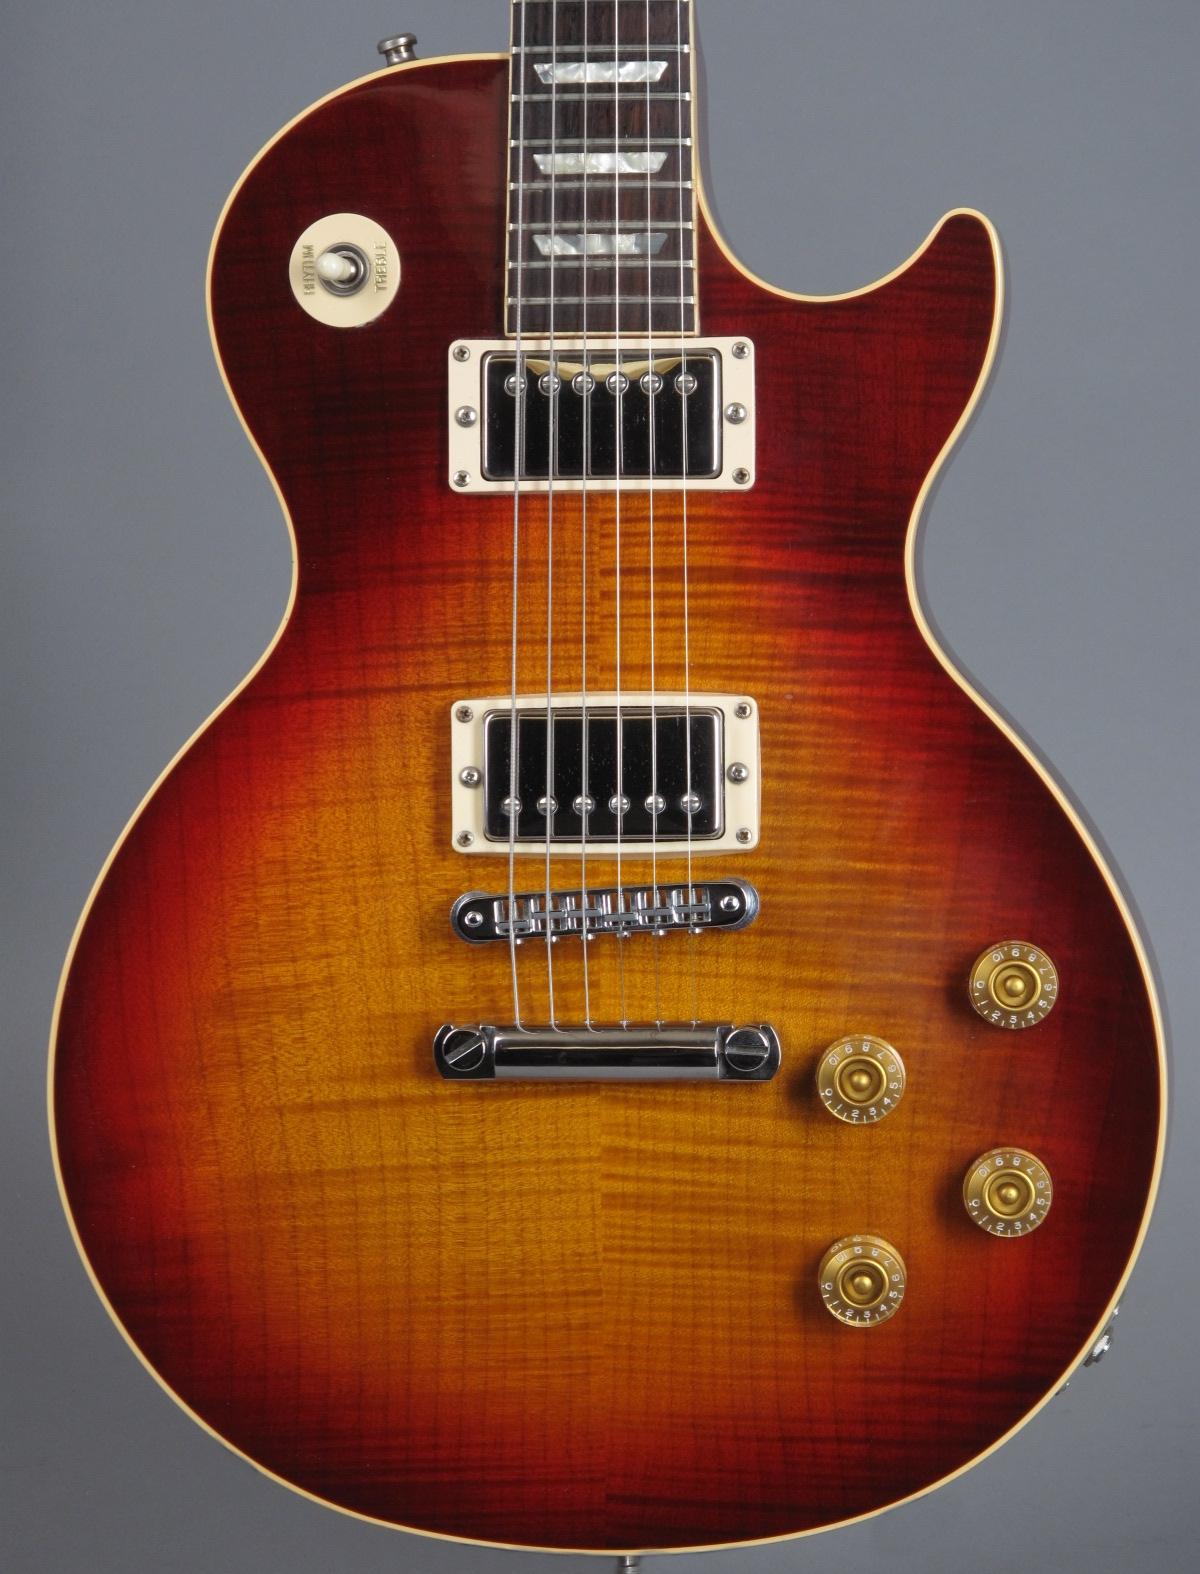 1989 Gibson Les Paul Standard - Heritage Cherry Sunburst ...lightweight!